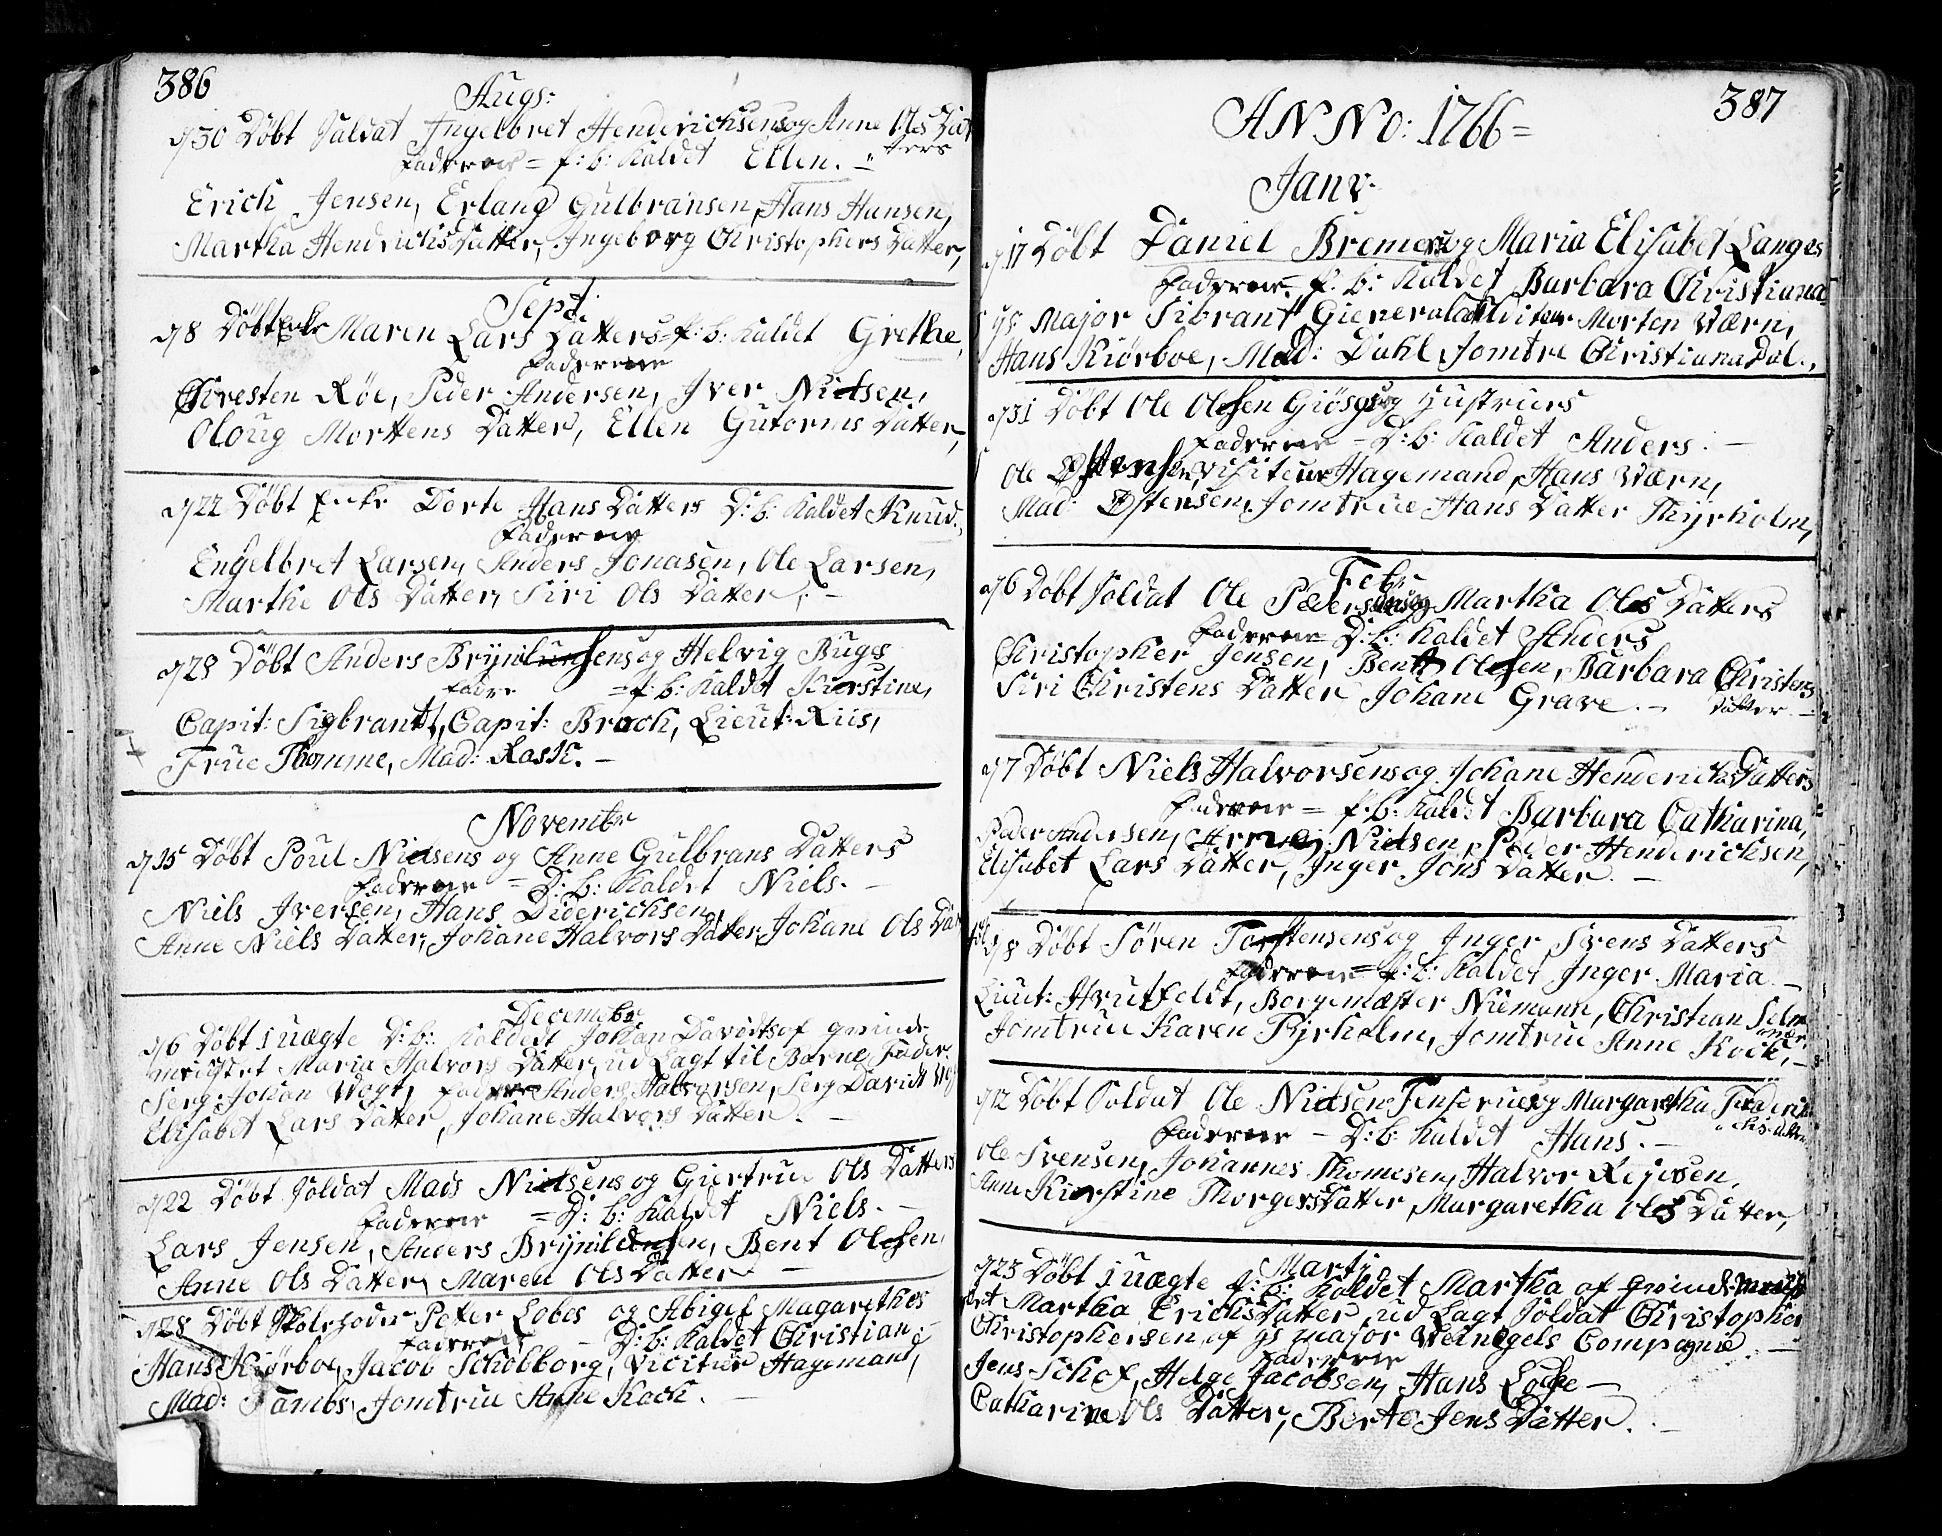 SAO, Fredrikstad prestekontor Kirkebøker, F/Fa/L0002: Ministerialbok nr. 2, 1750-1804, s. 386-387